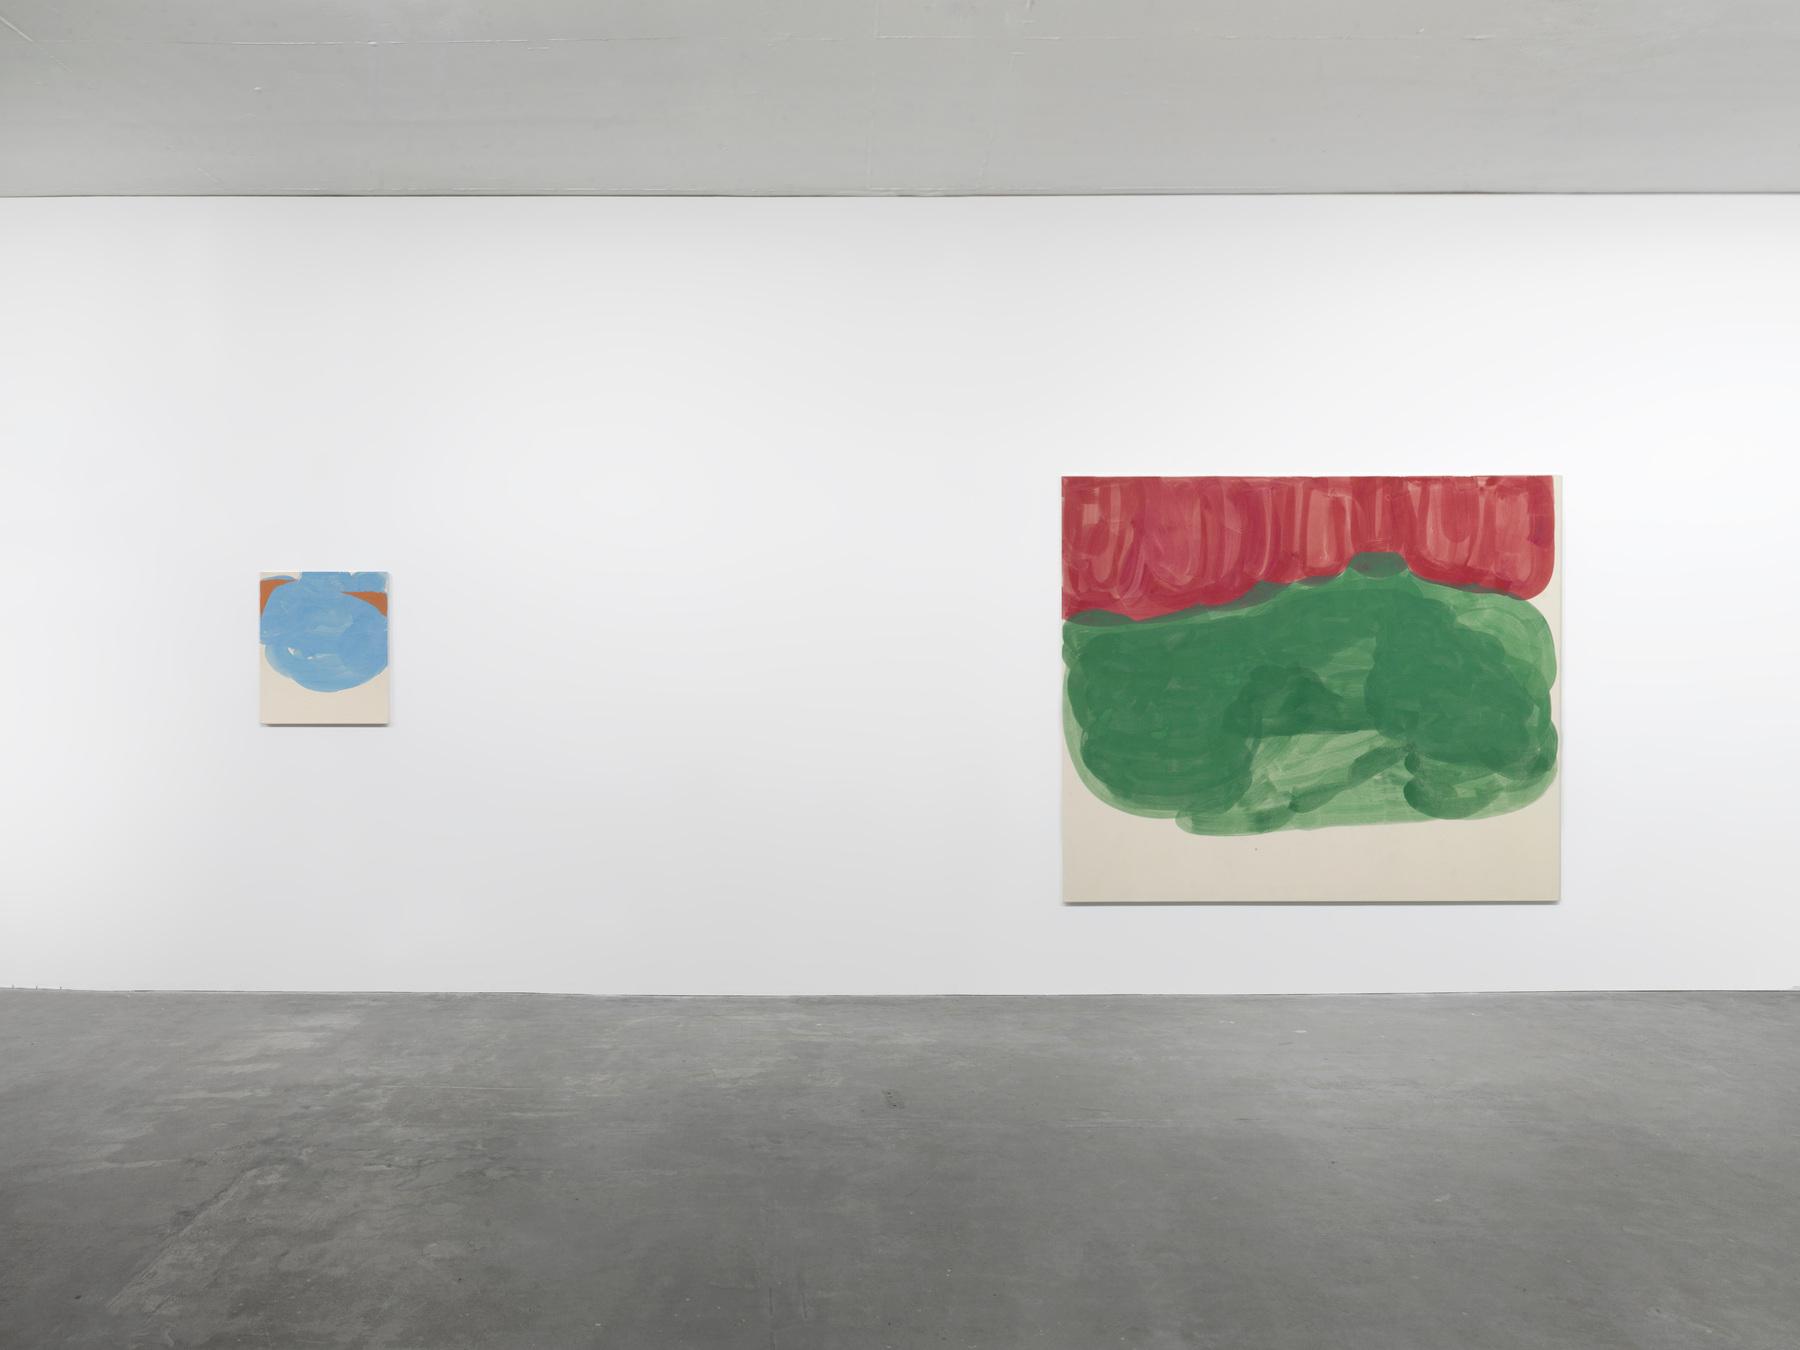 Tamina Amadyar_10,000 hours_Galerie Guido W. Baudach, Berlin_02